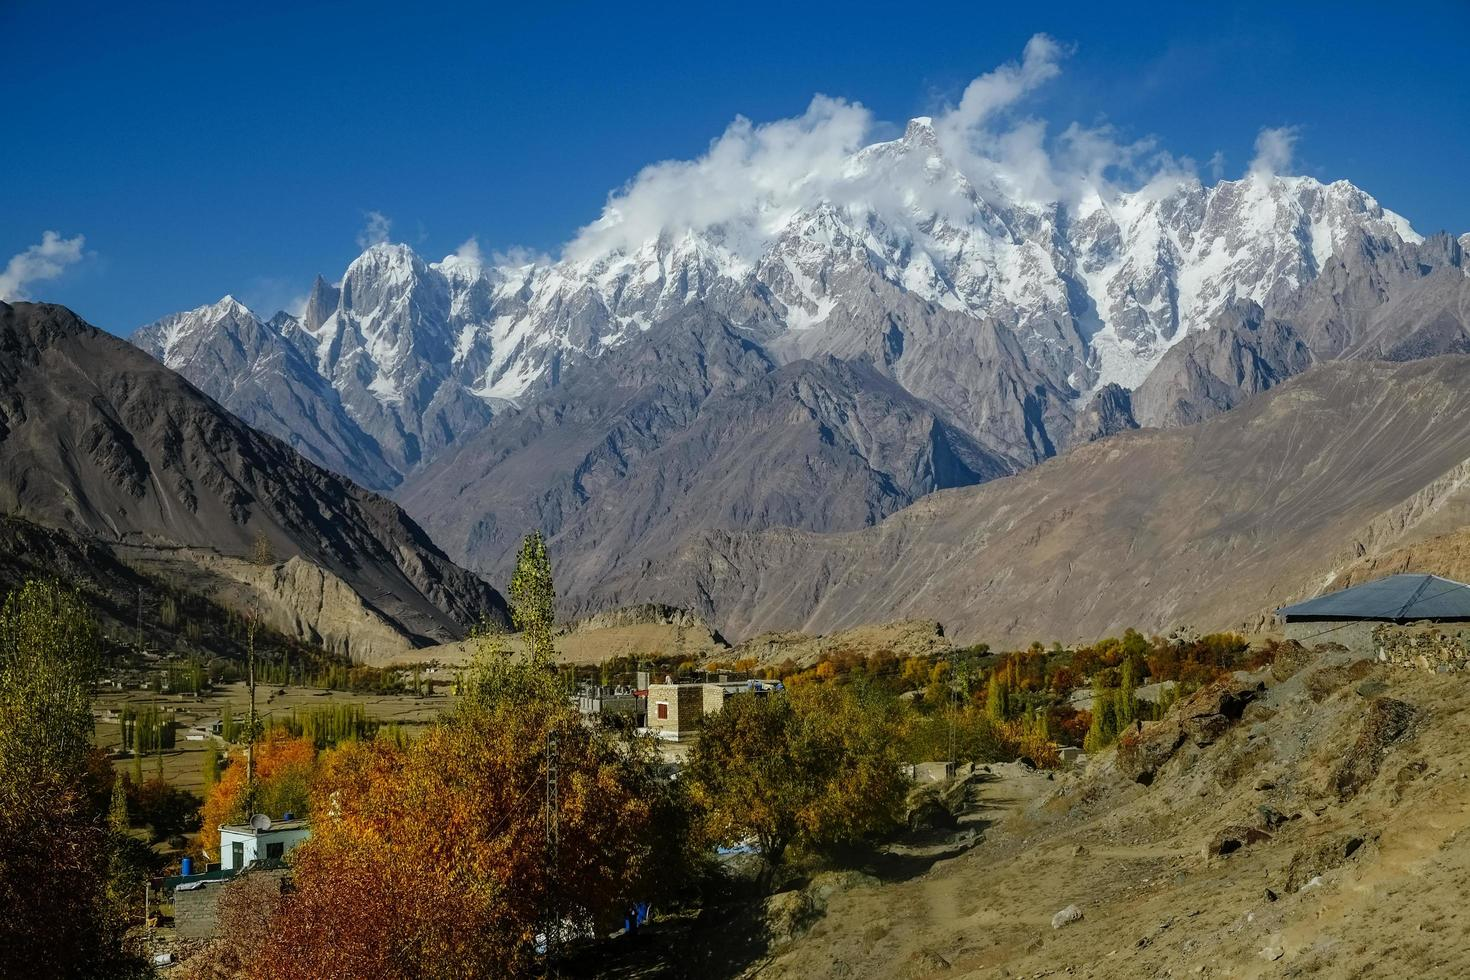 Snow capped Karakoram mountain range in Pakistan photo